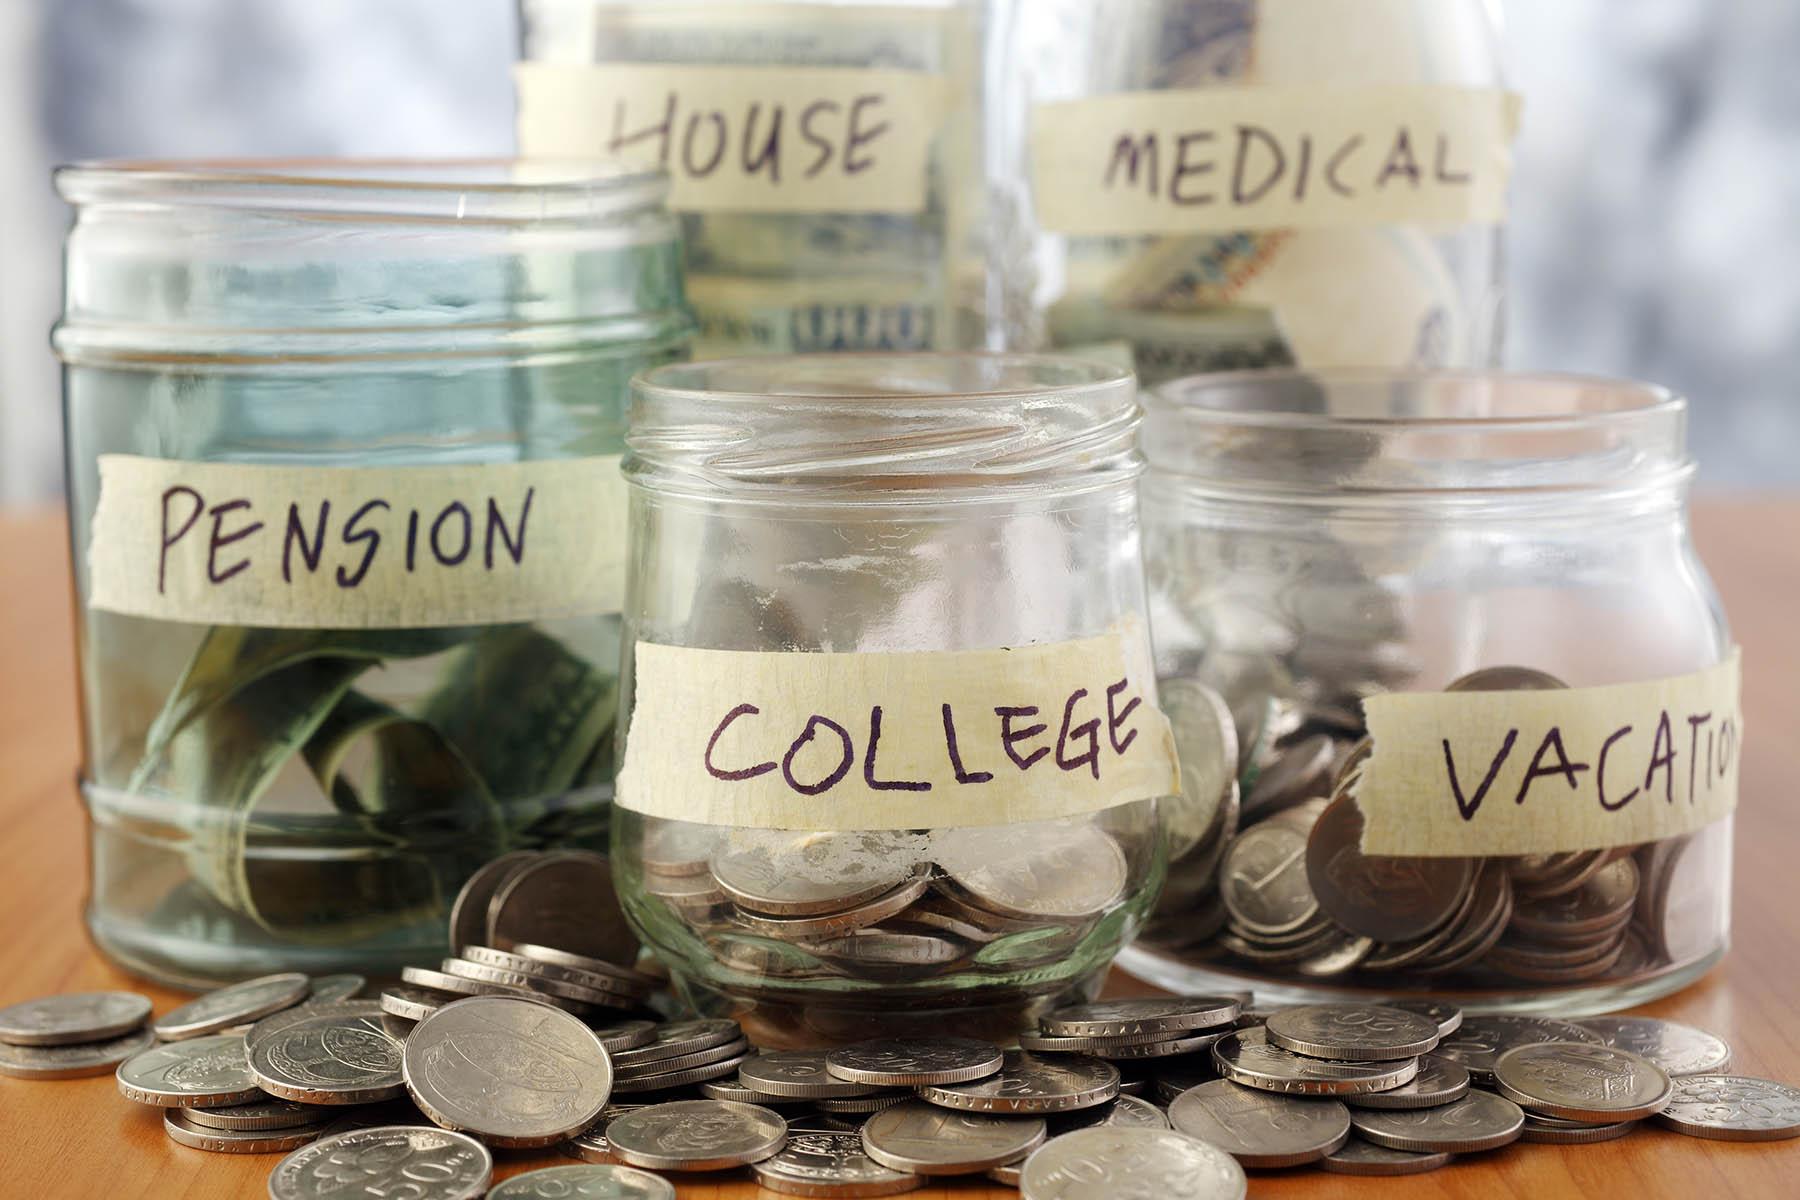 Savings jars college pension vacation medical house